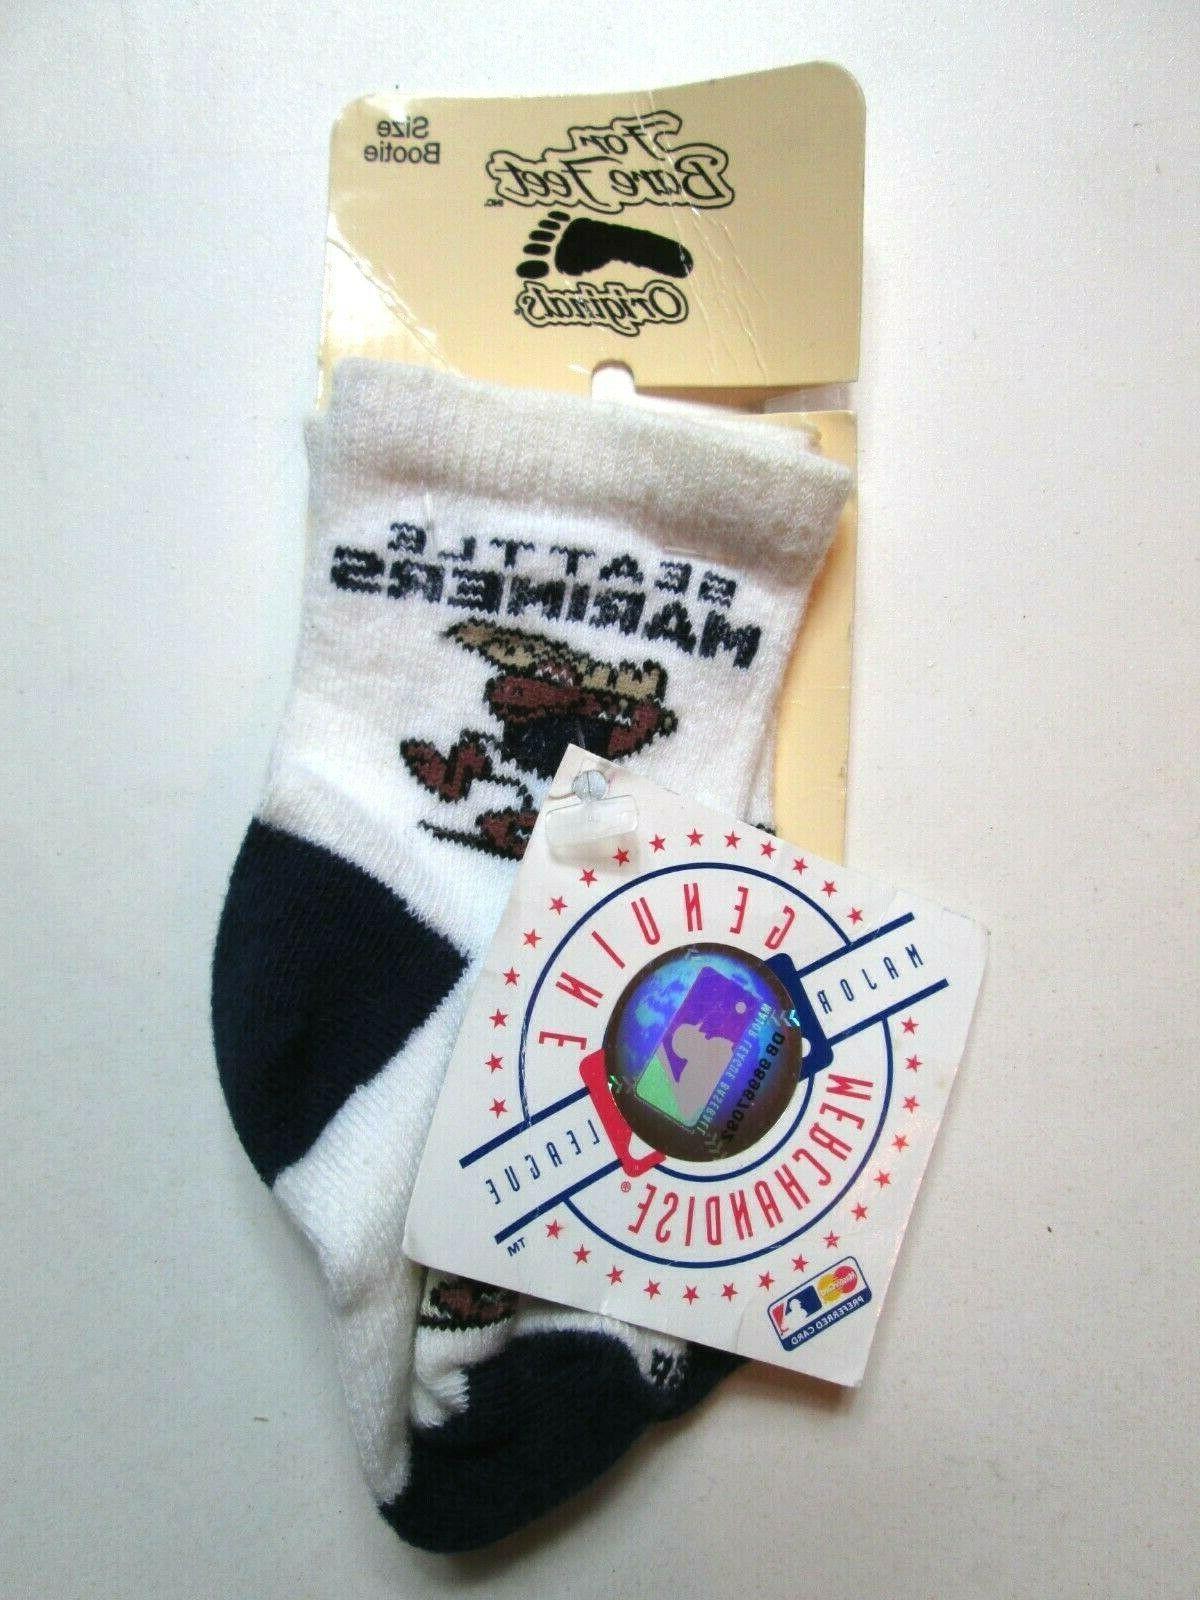 fbf originals baby socks size bootie seattle